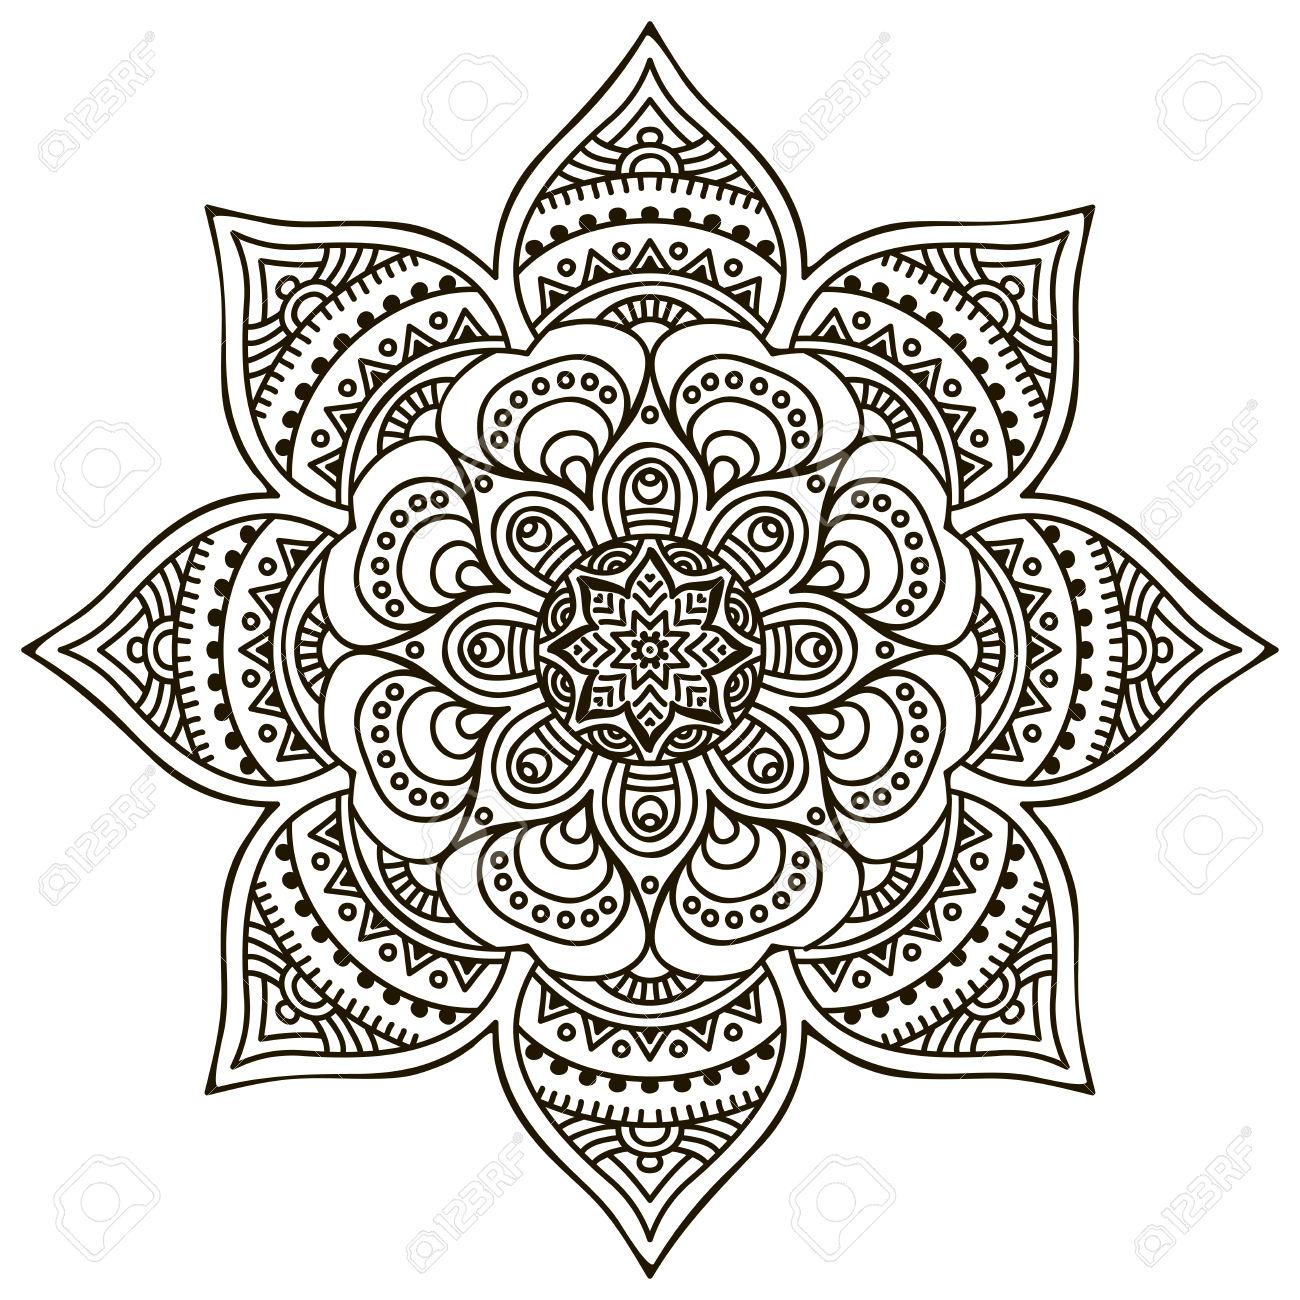 Brown round floral mandala, download royalty.